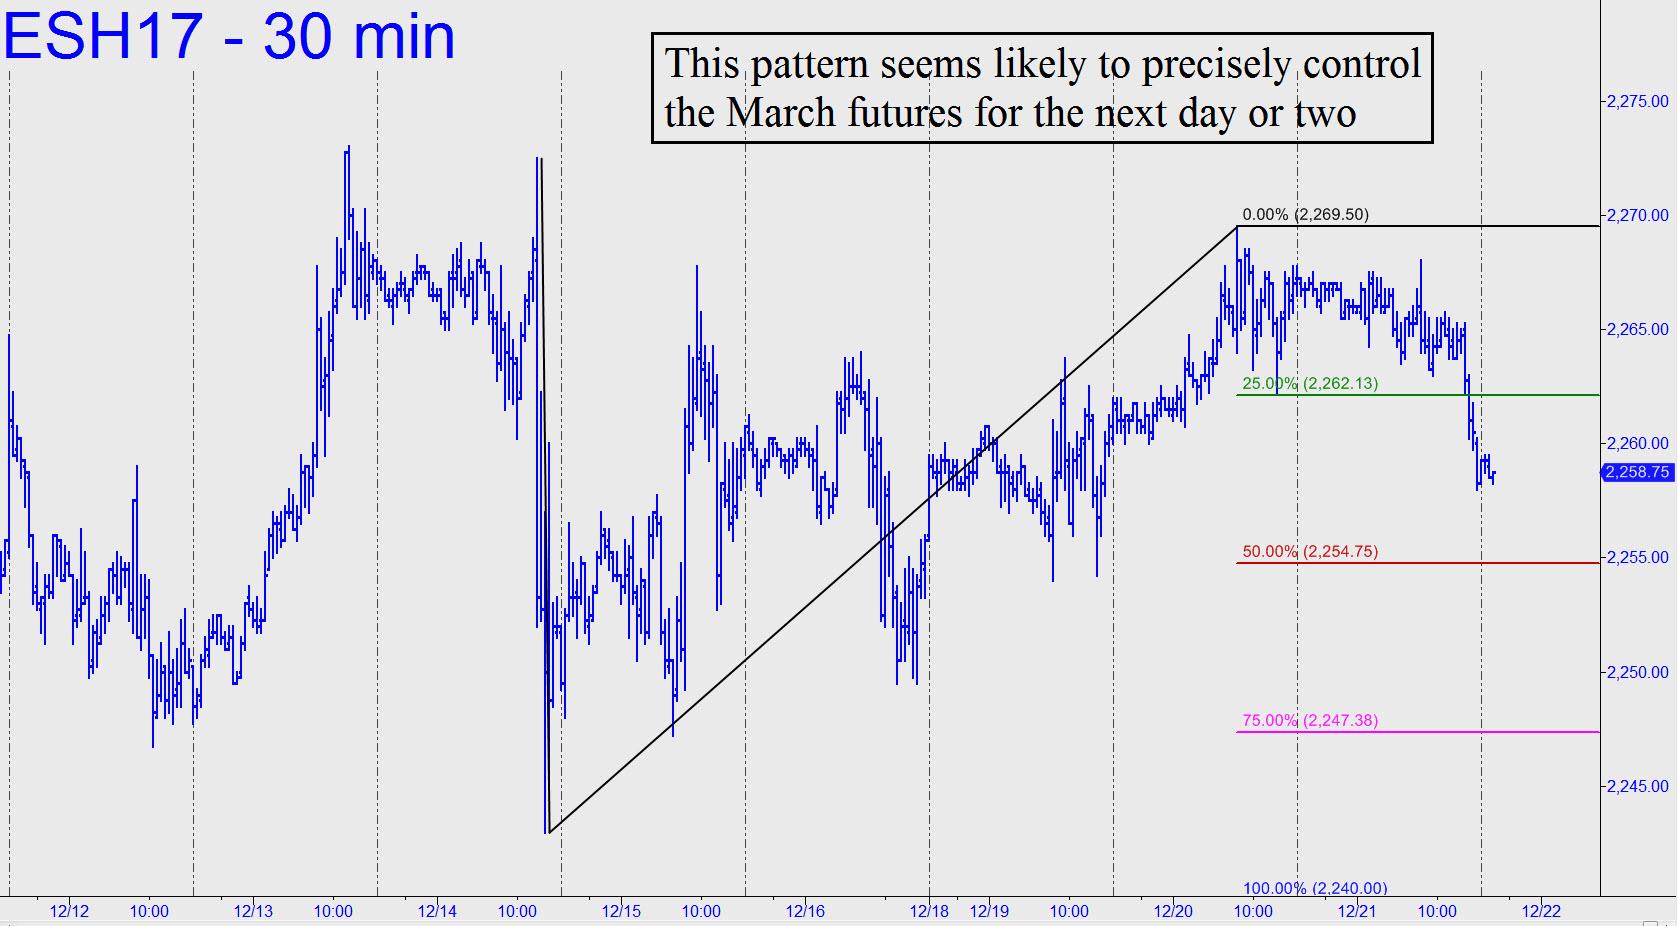 http://www.rickackerman.com/wp-content/uploads/2016/12/Pattern-will-controil-ES.jpg